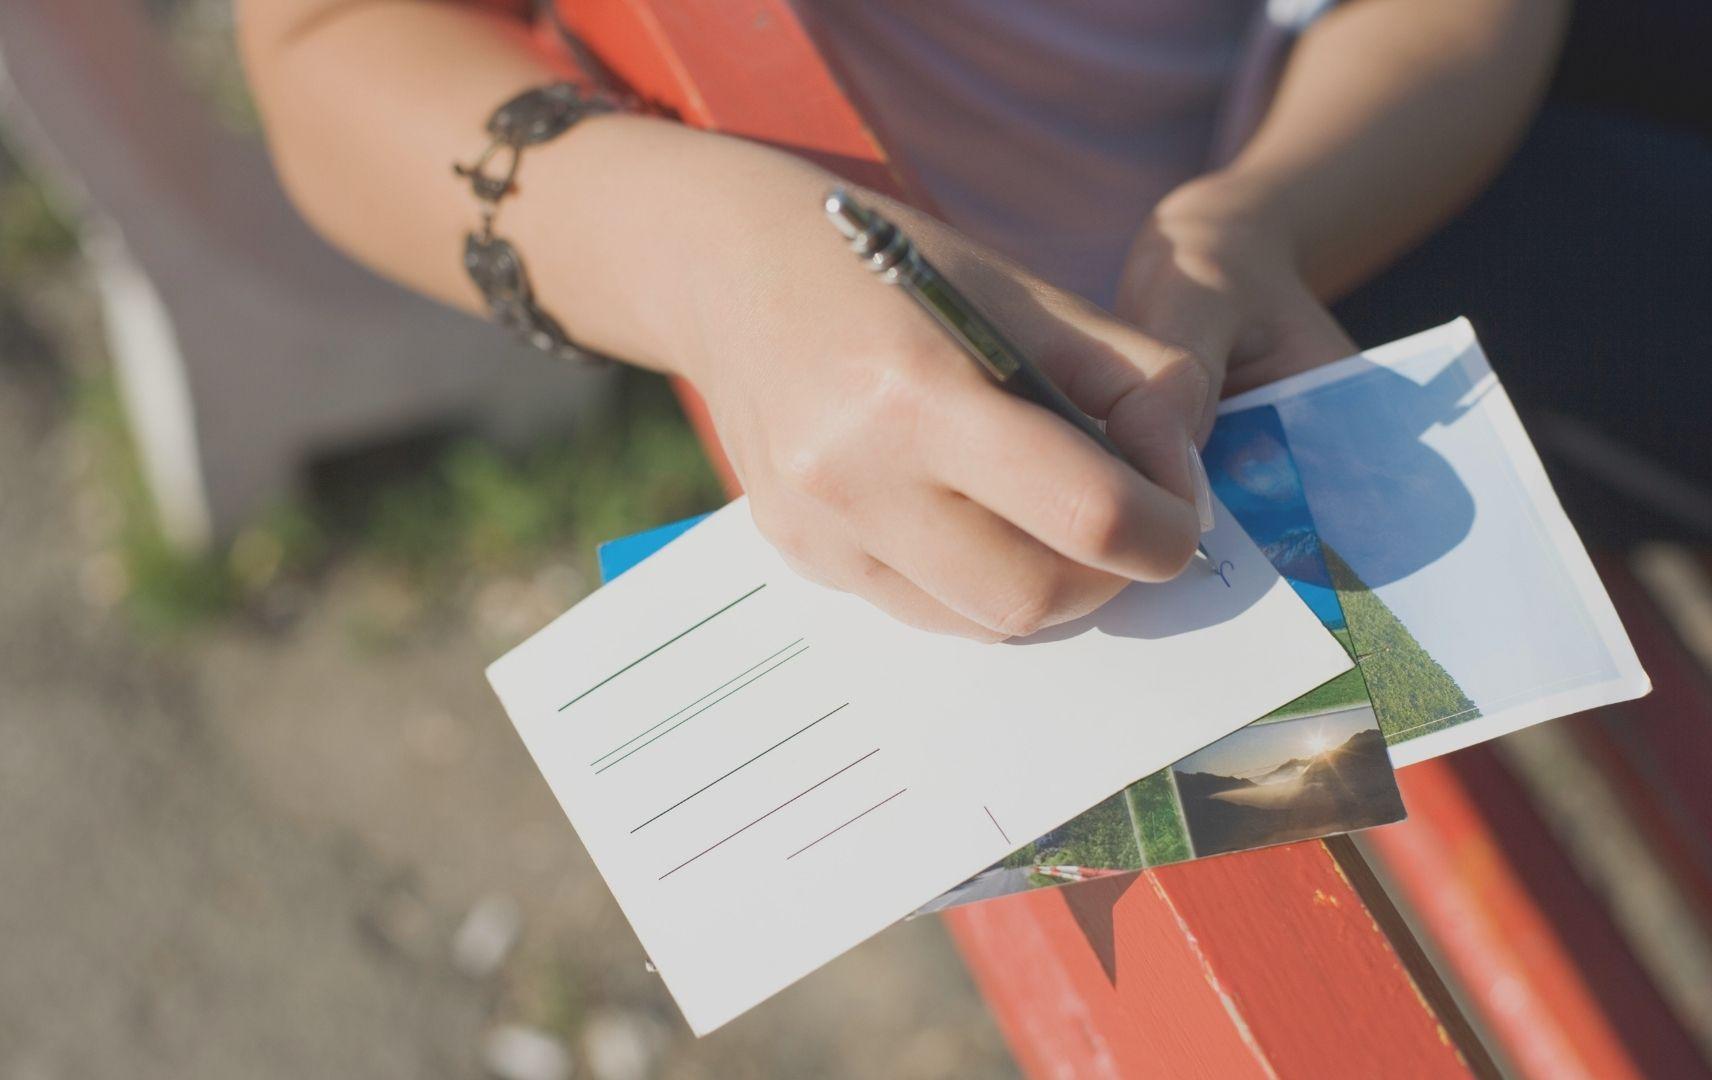 Kreuzfahrt - Frau schreibt Postkarte